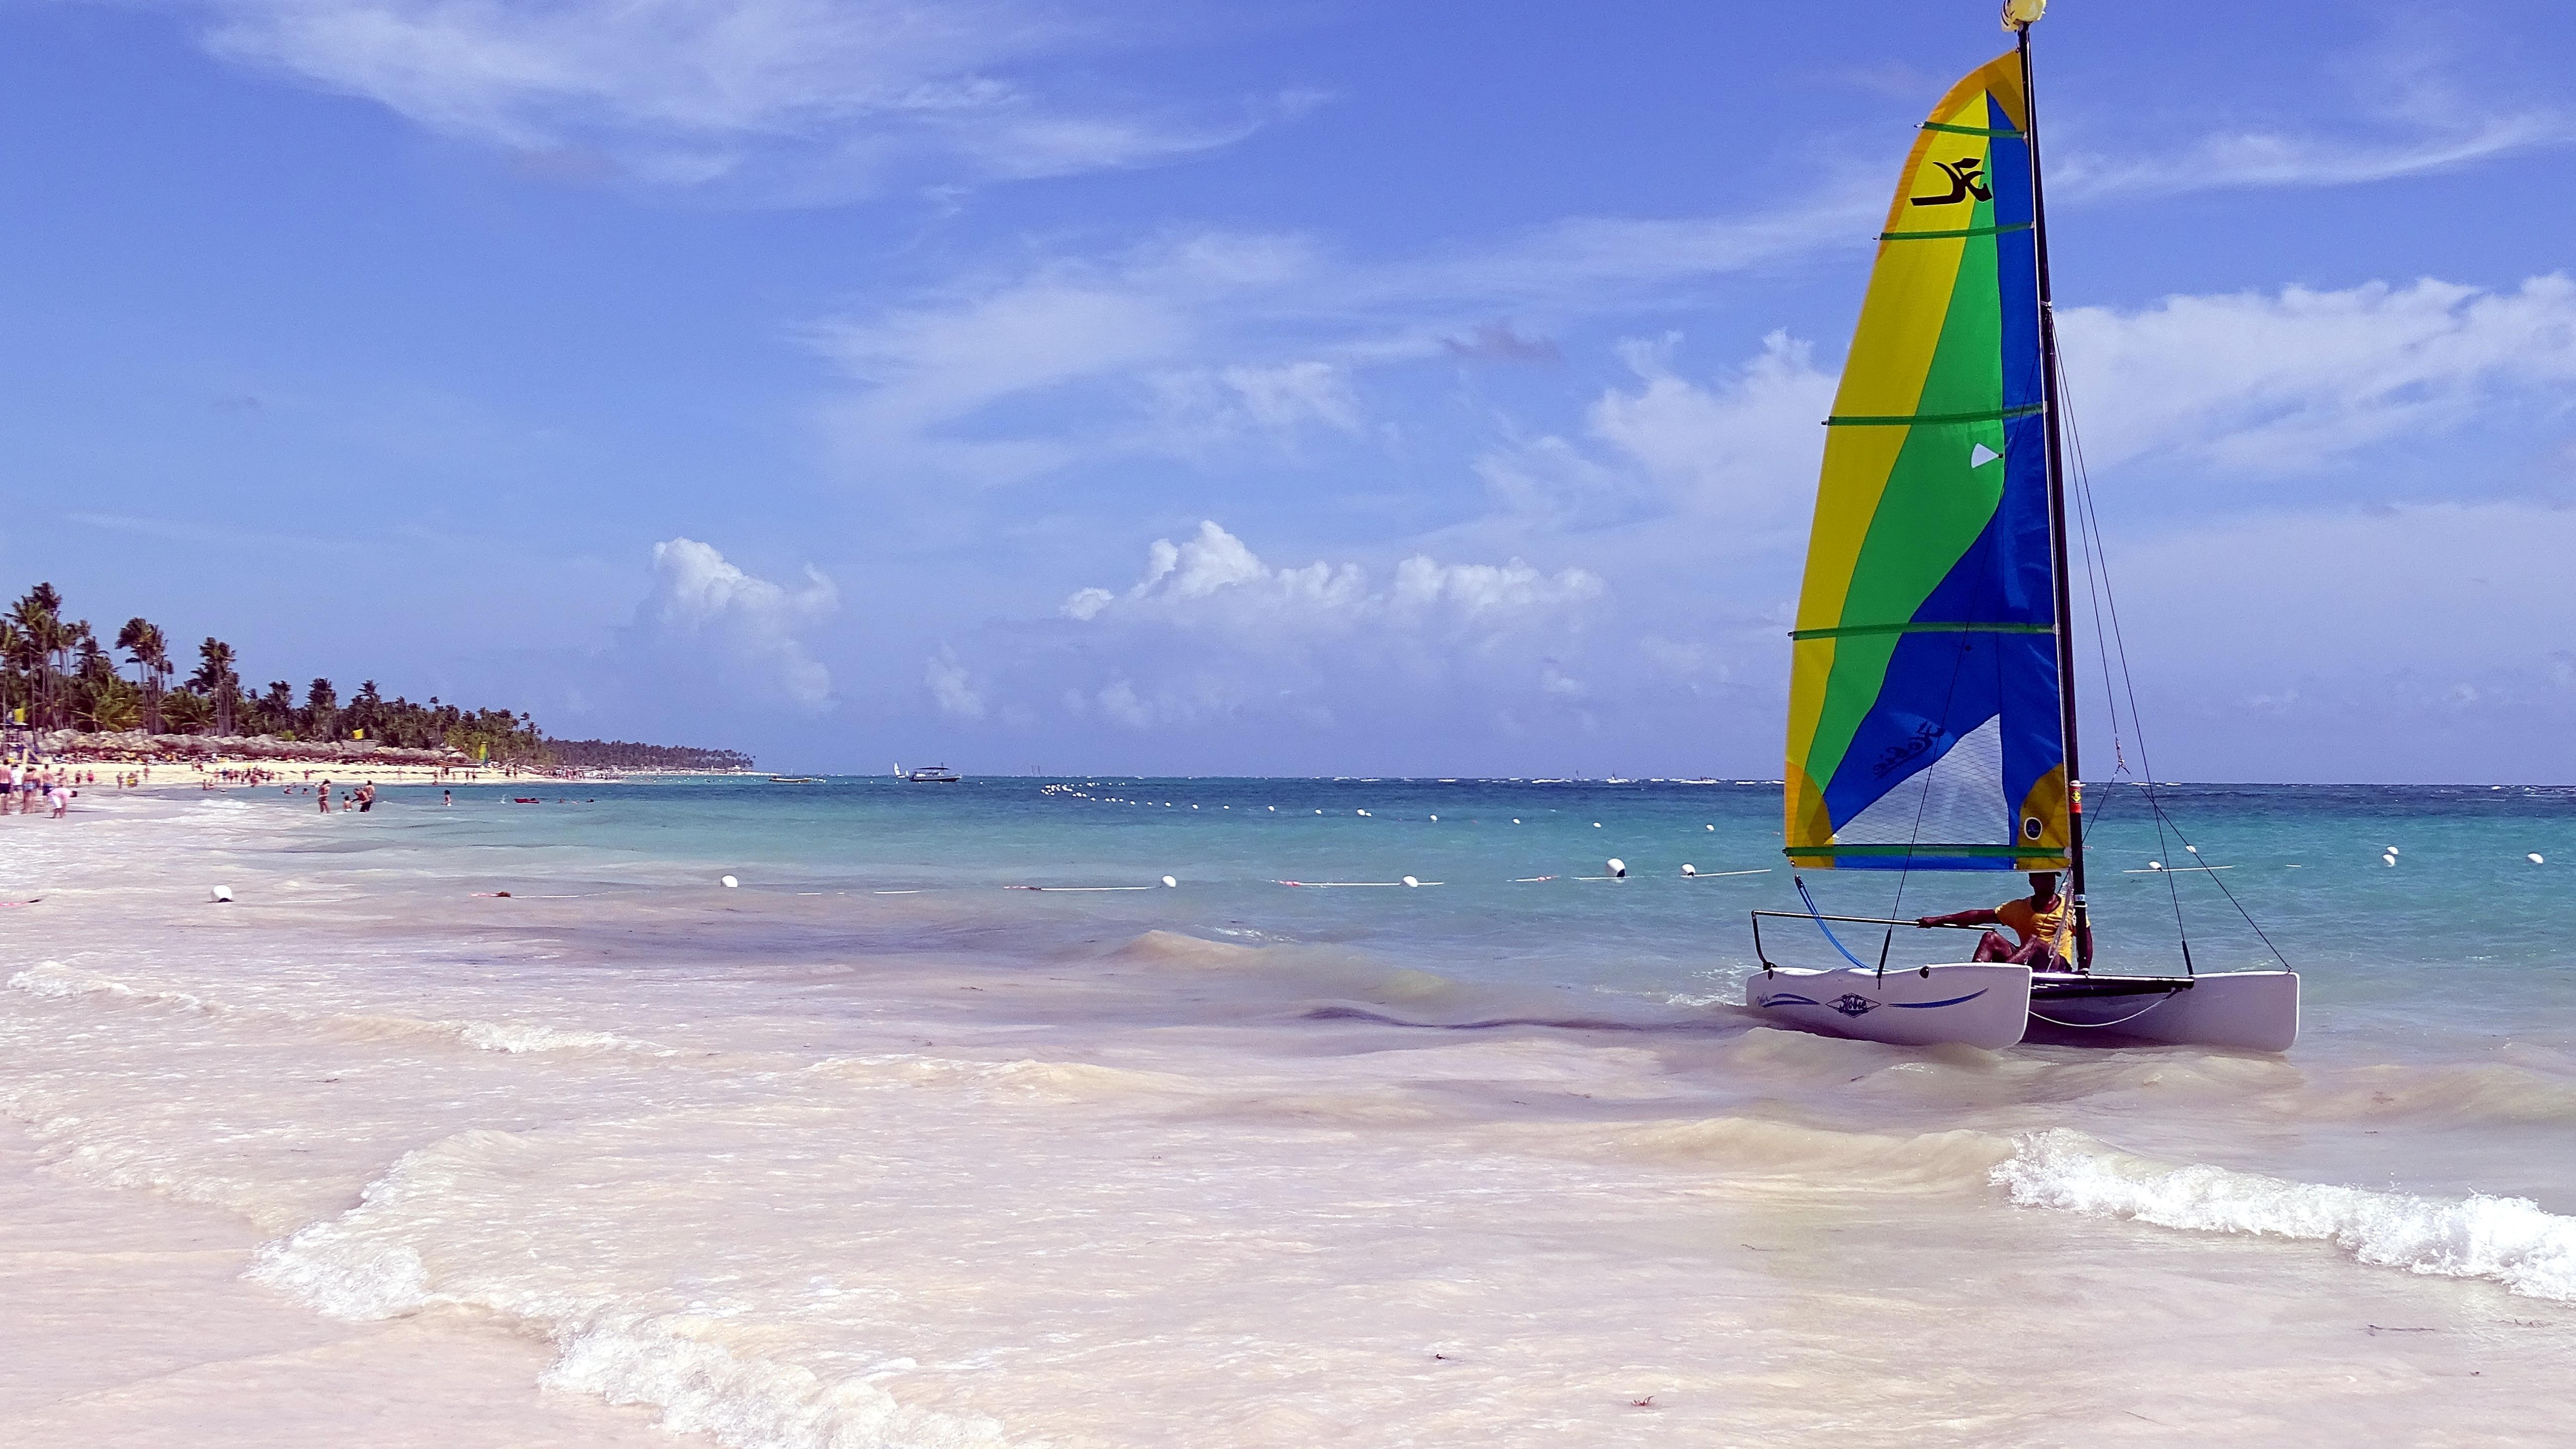 Beach of Punta Cana wallpaper